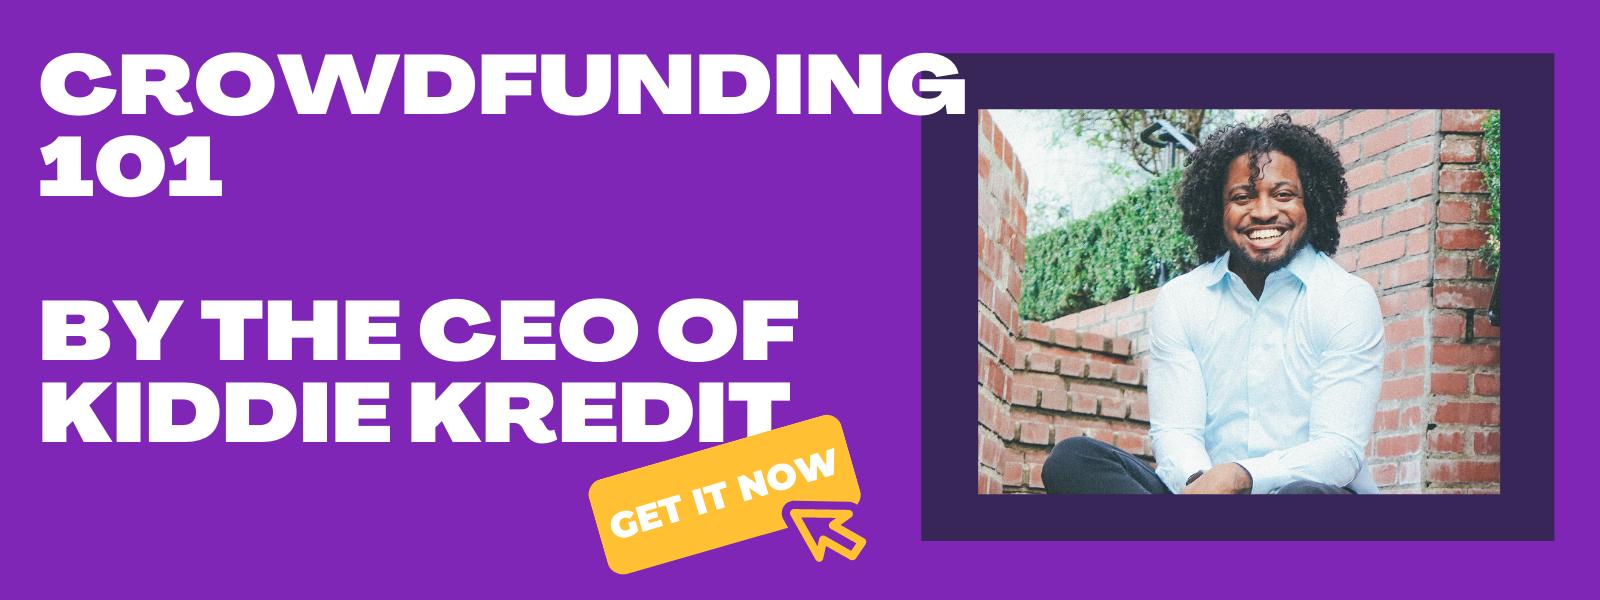 https://launch.mogulmillennial.com/course/crowdfunding-101